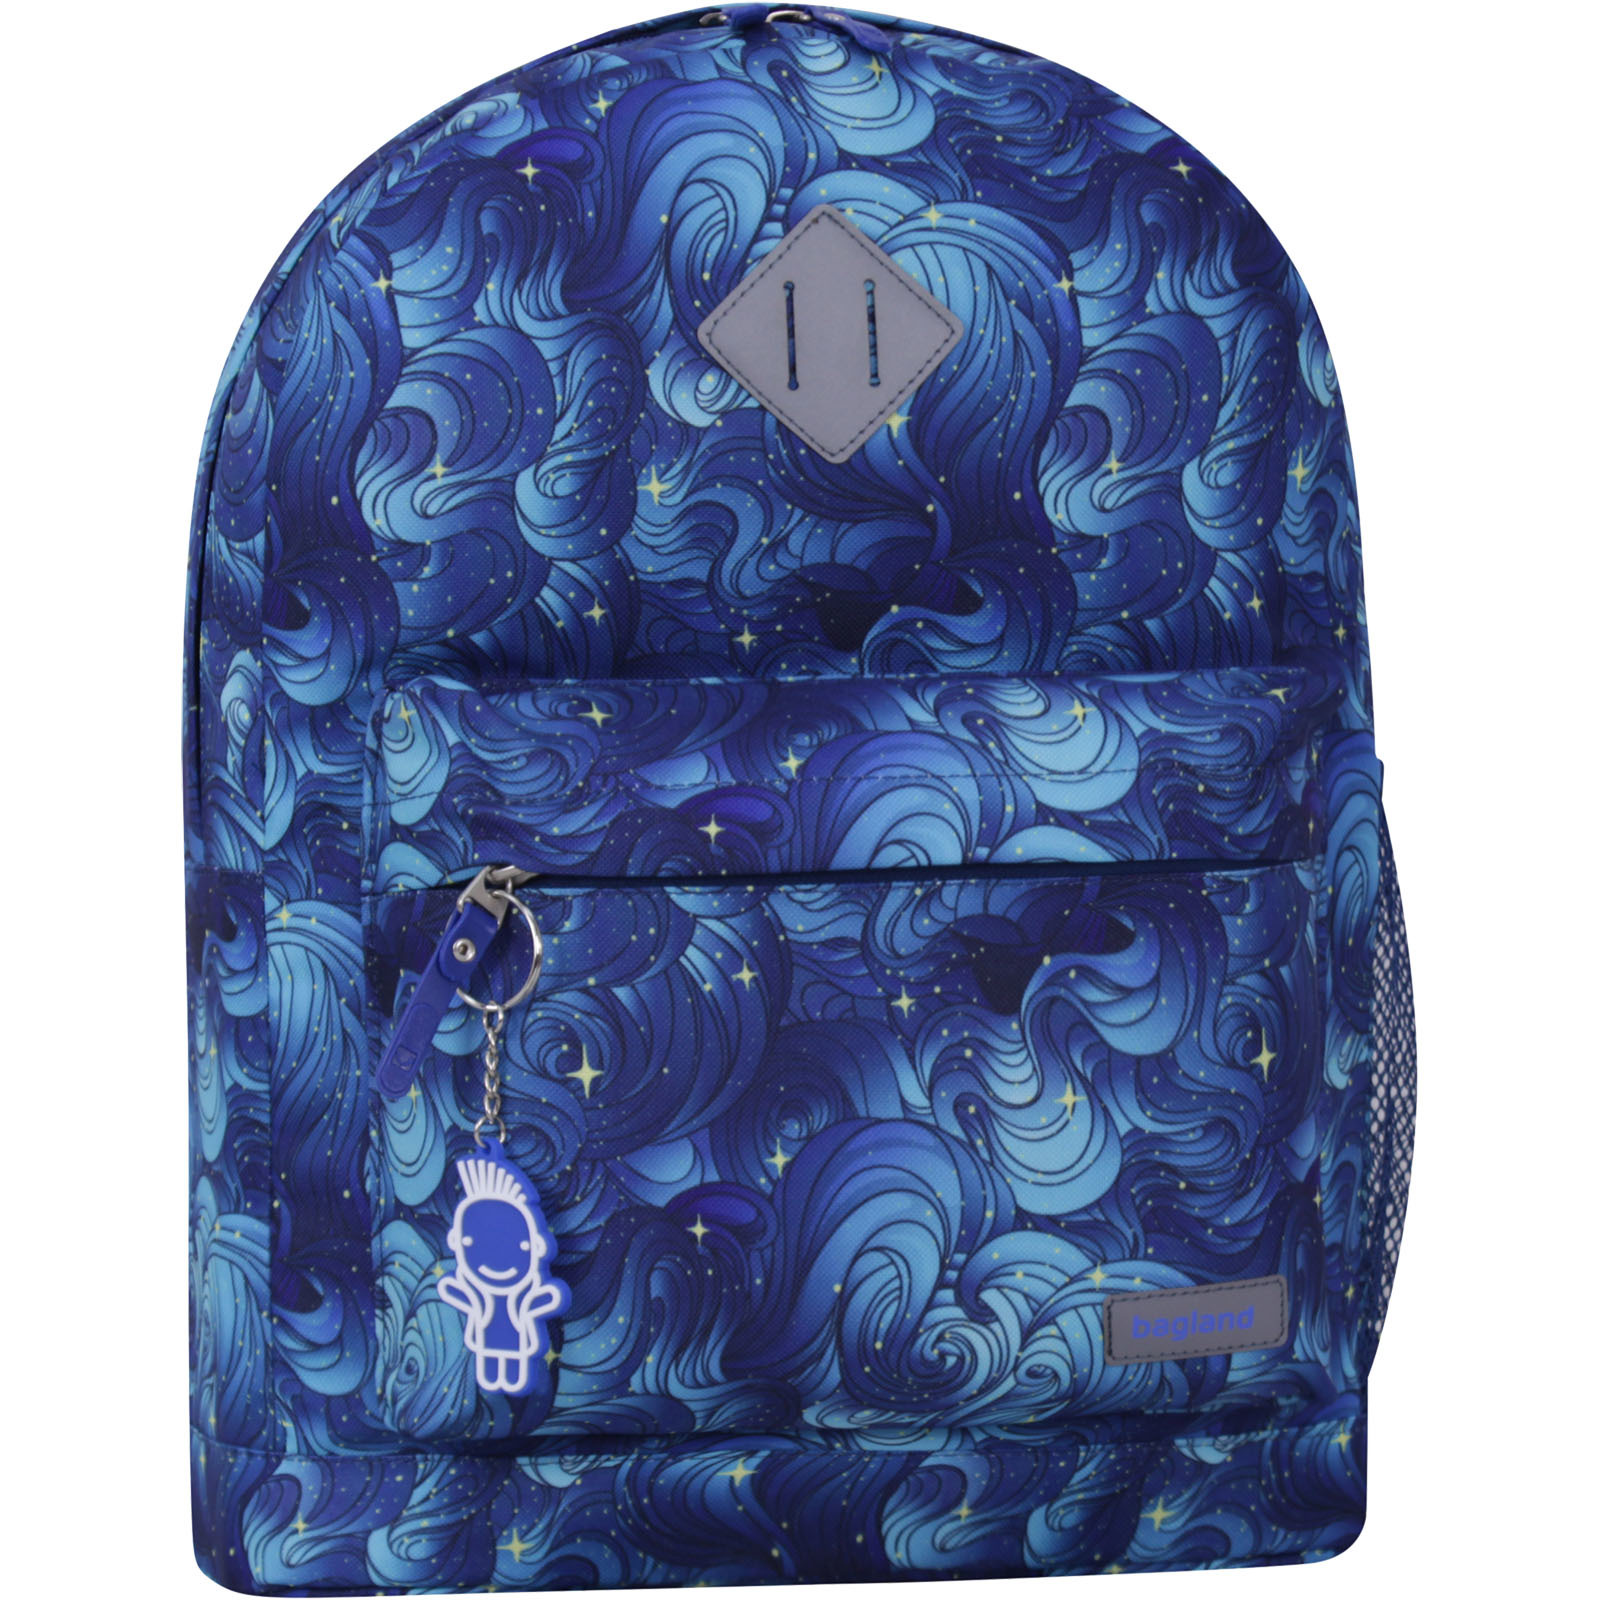 Городские рюкзаки Рюкзак Bagland Молодежный 17 л. сублимация 987 (00533664) IMG_0356_суб.987_-1600.jpg